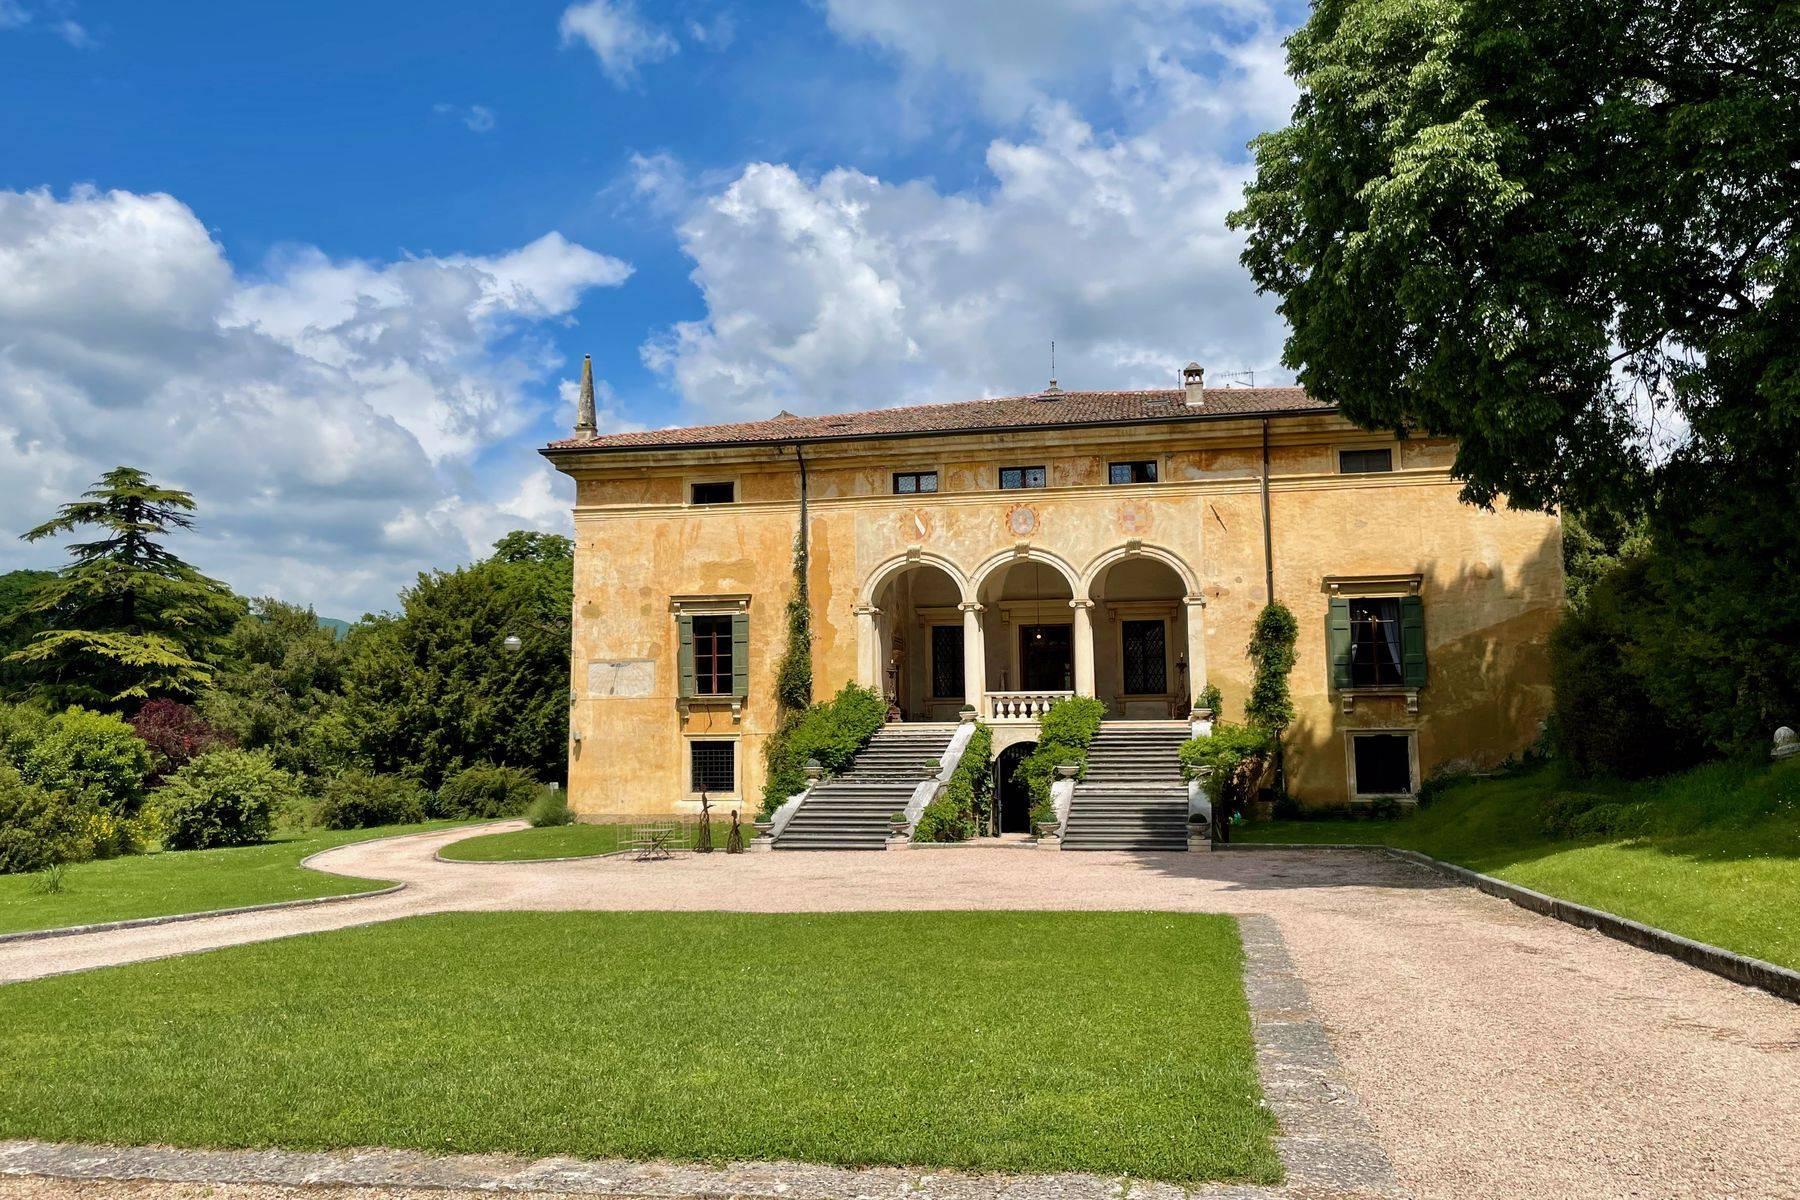 Affascinante villa Veneta a pochi minuti da Verona - 43